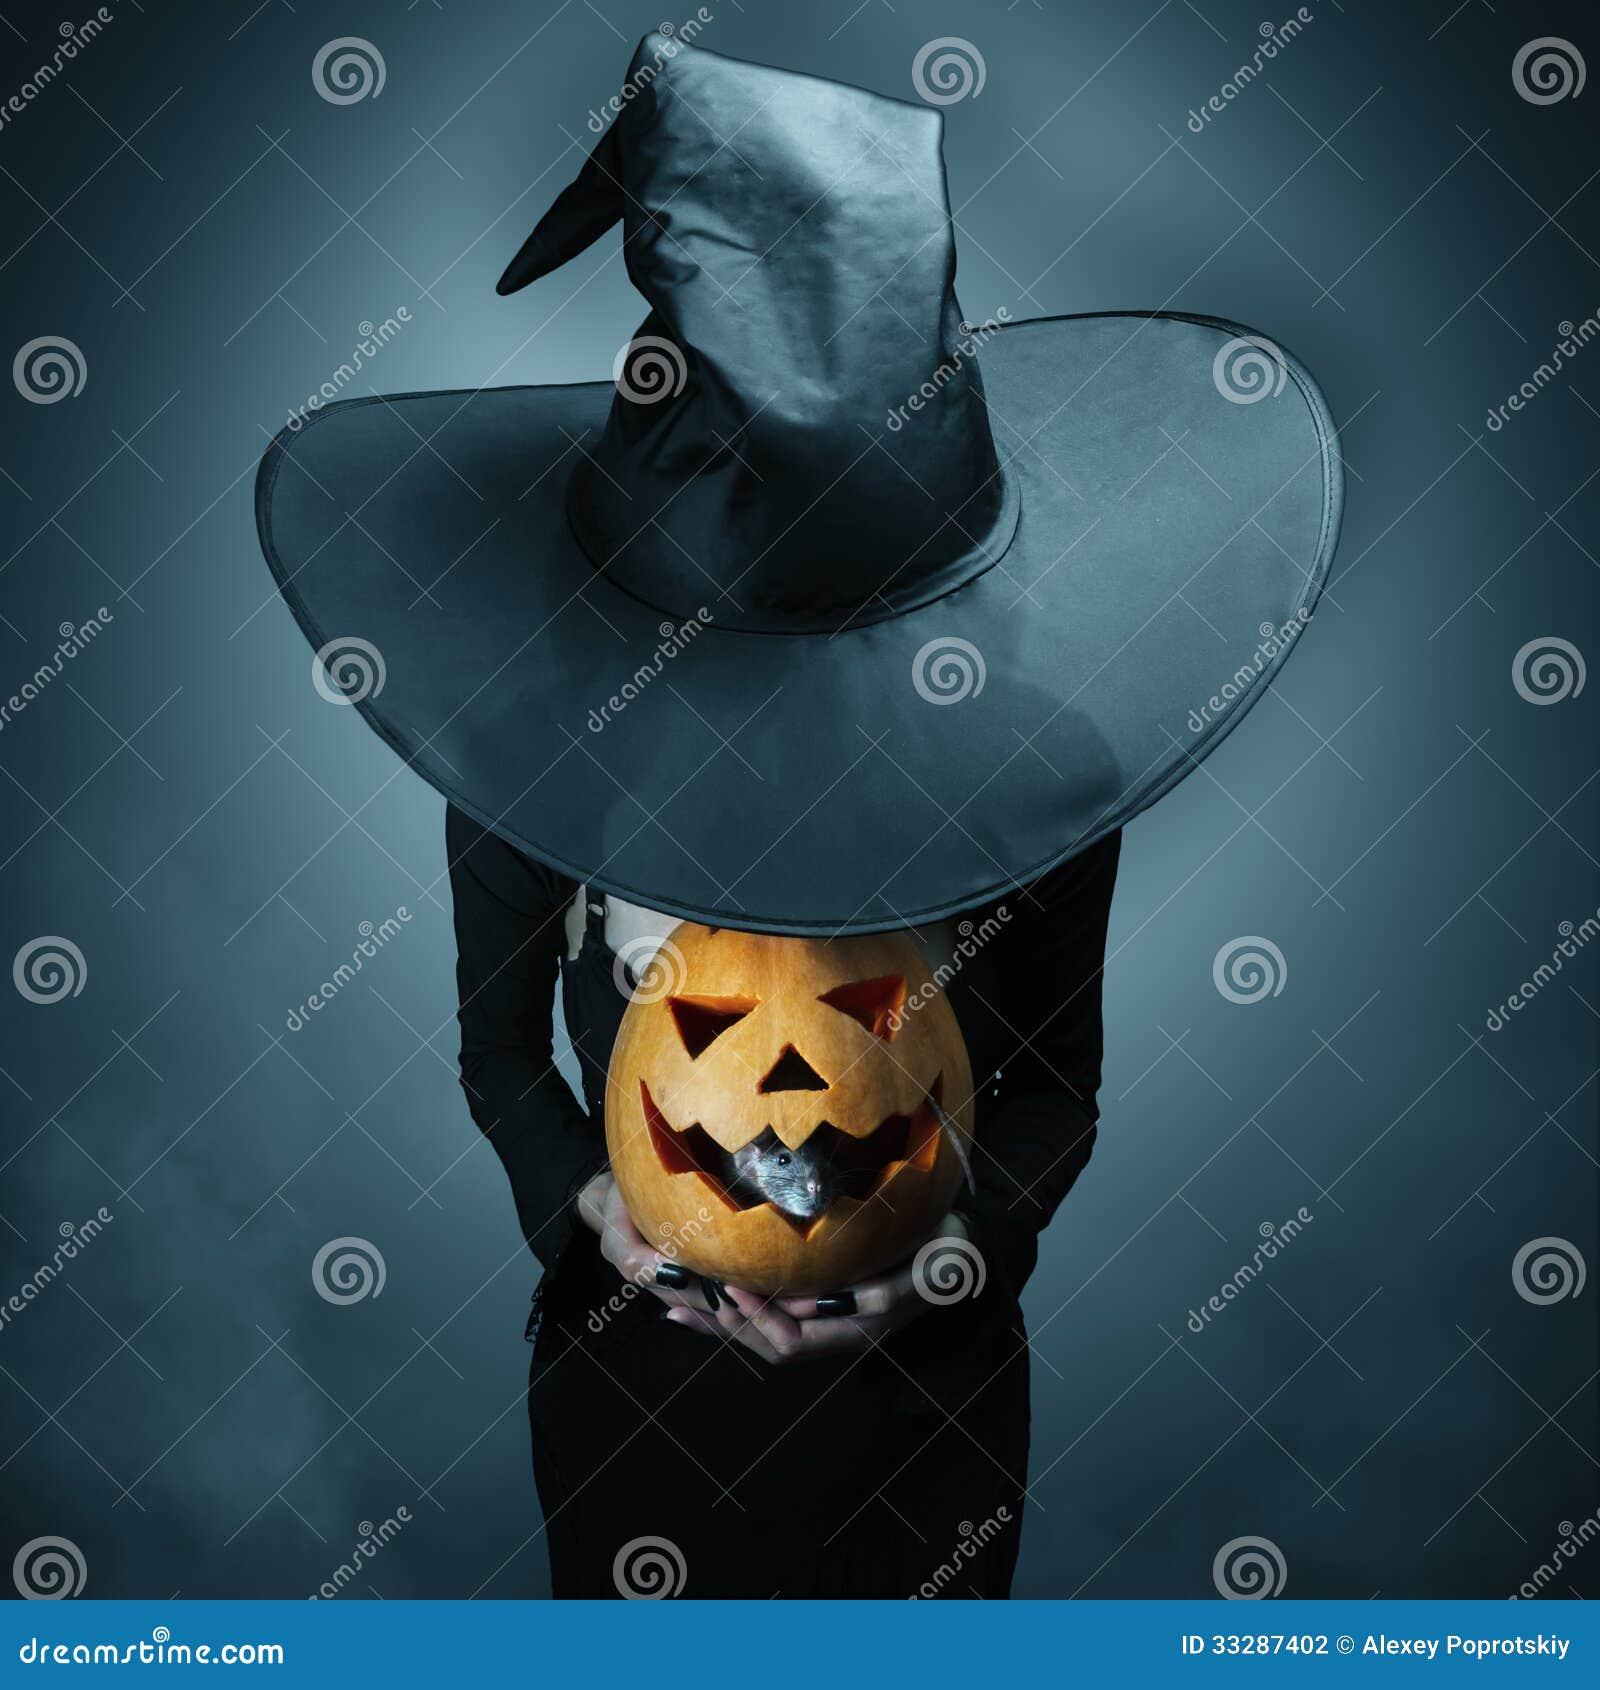 Halloween pumpkin and gray rat